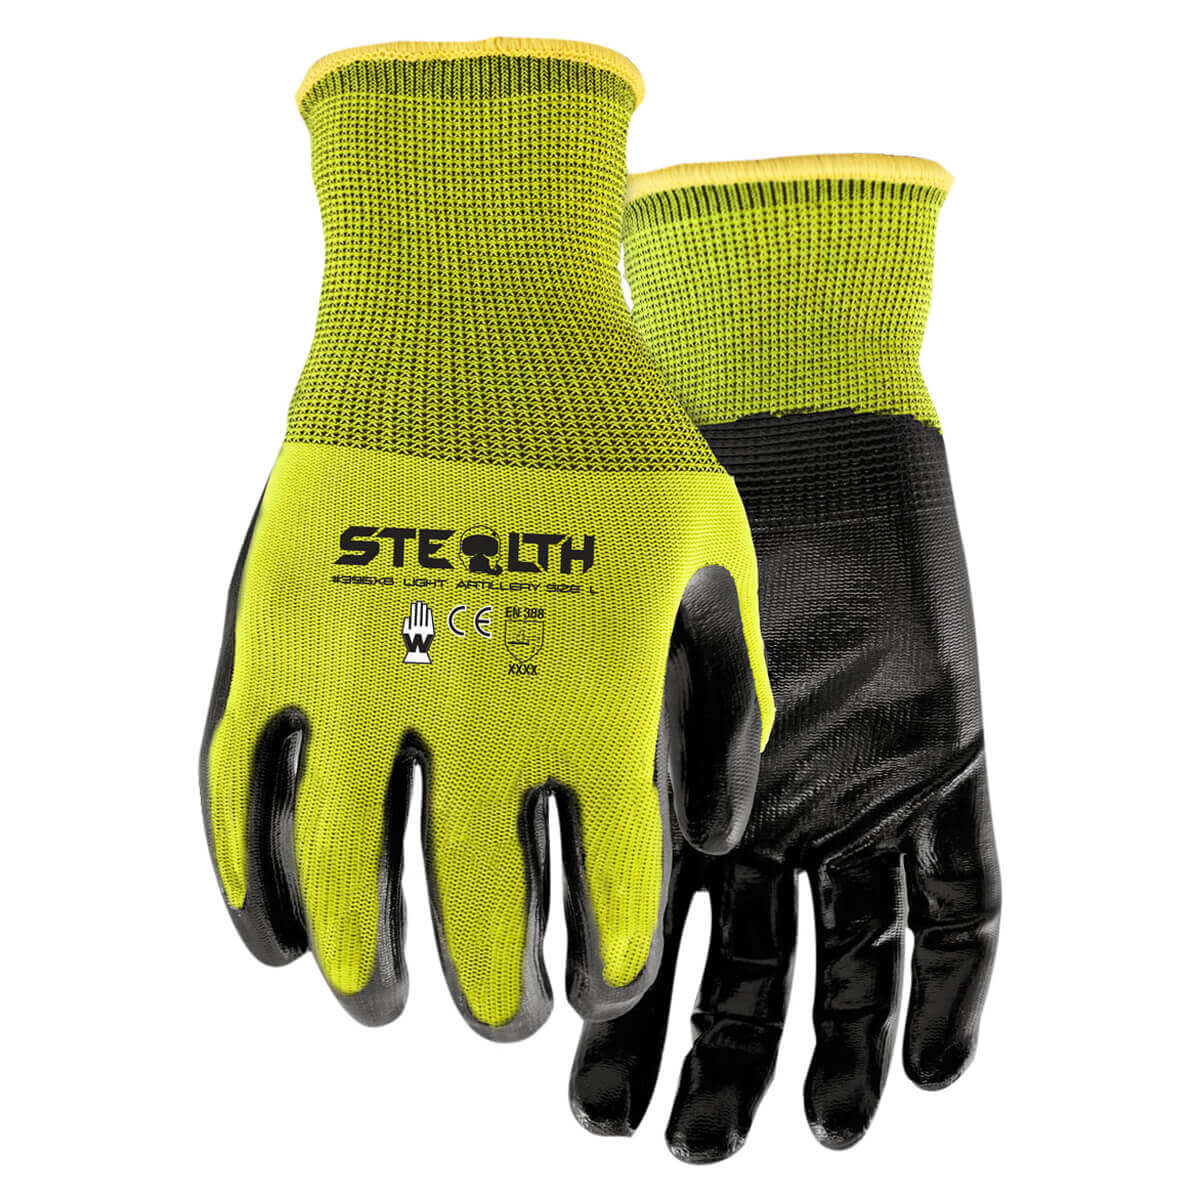 Stealth Light Artillery Gloves - 6 pack